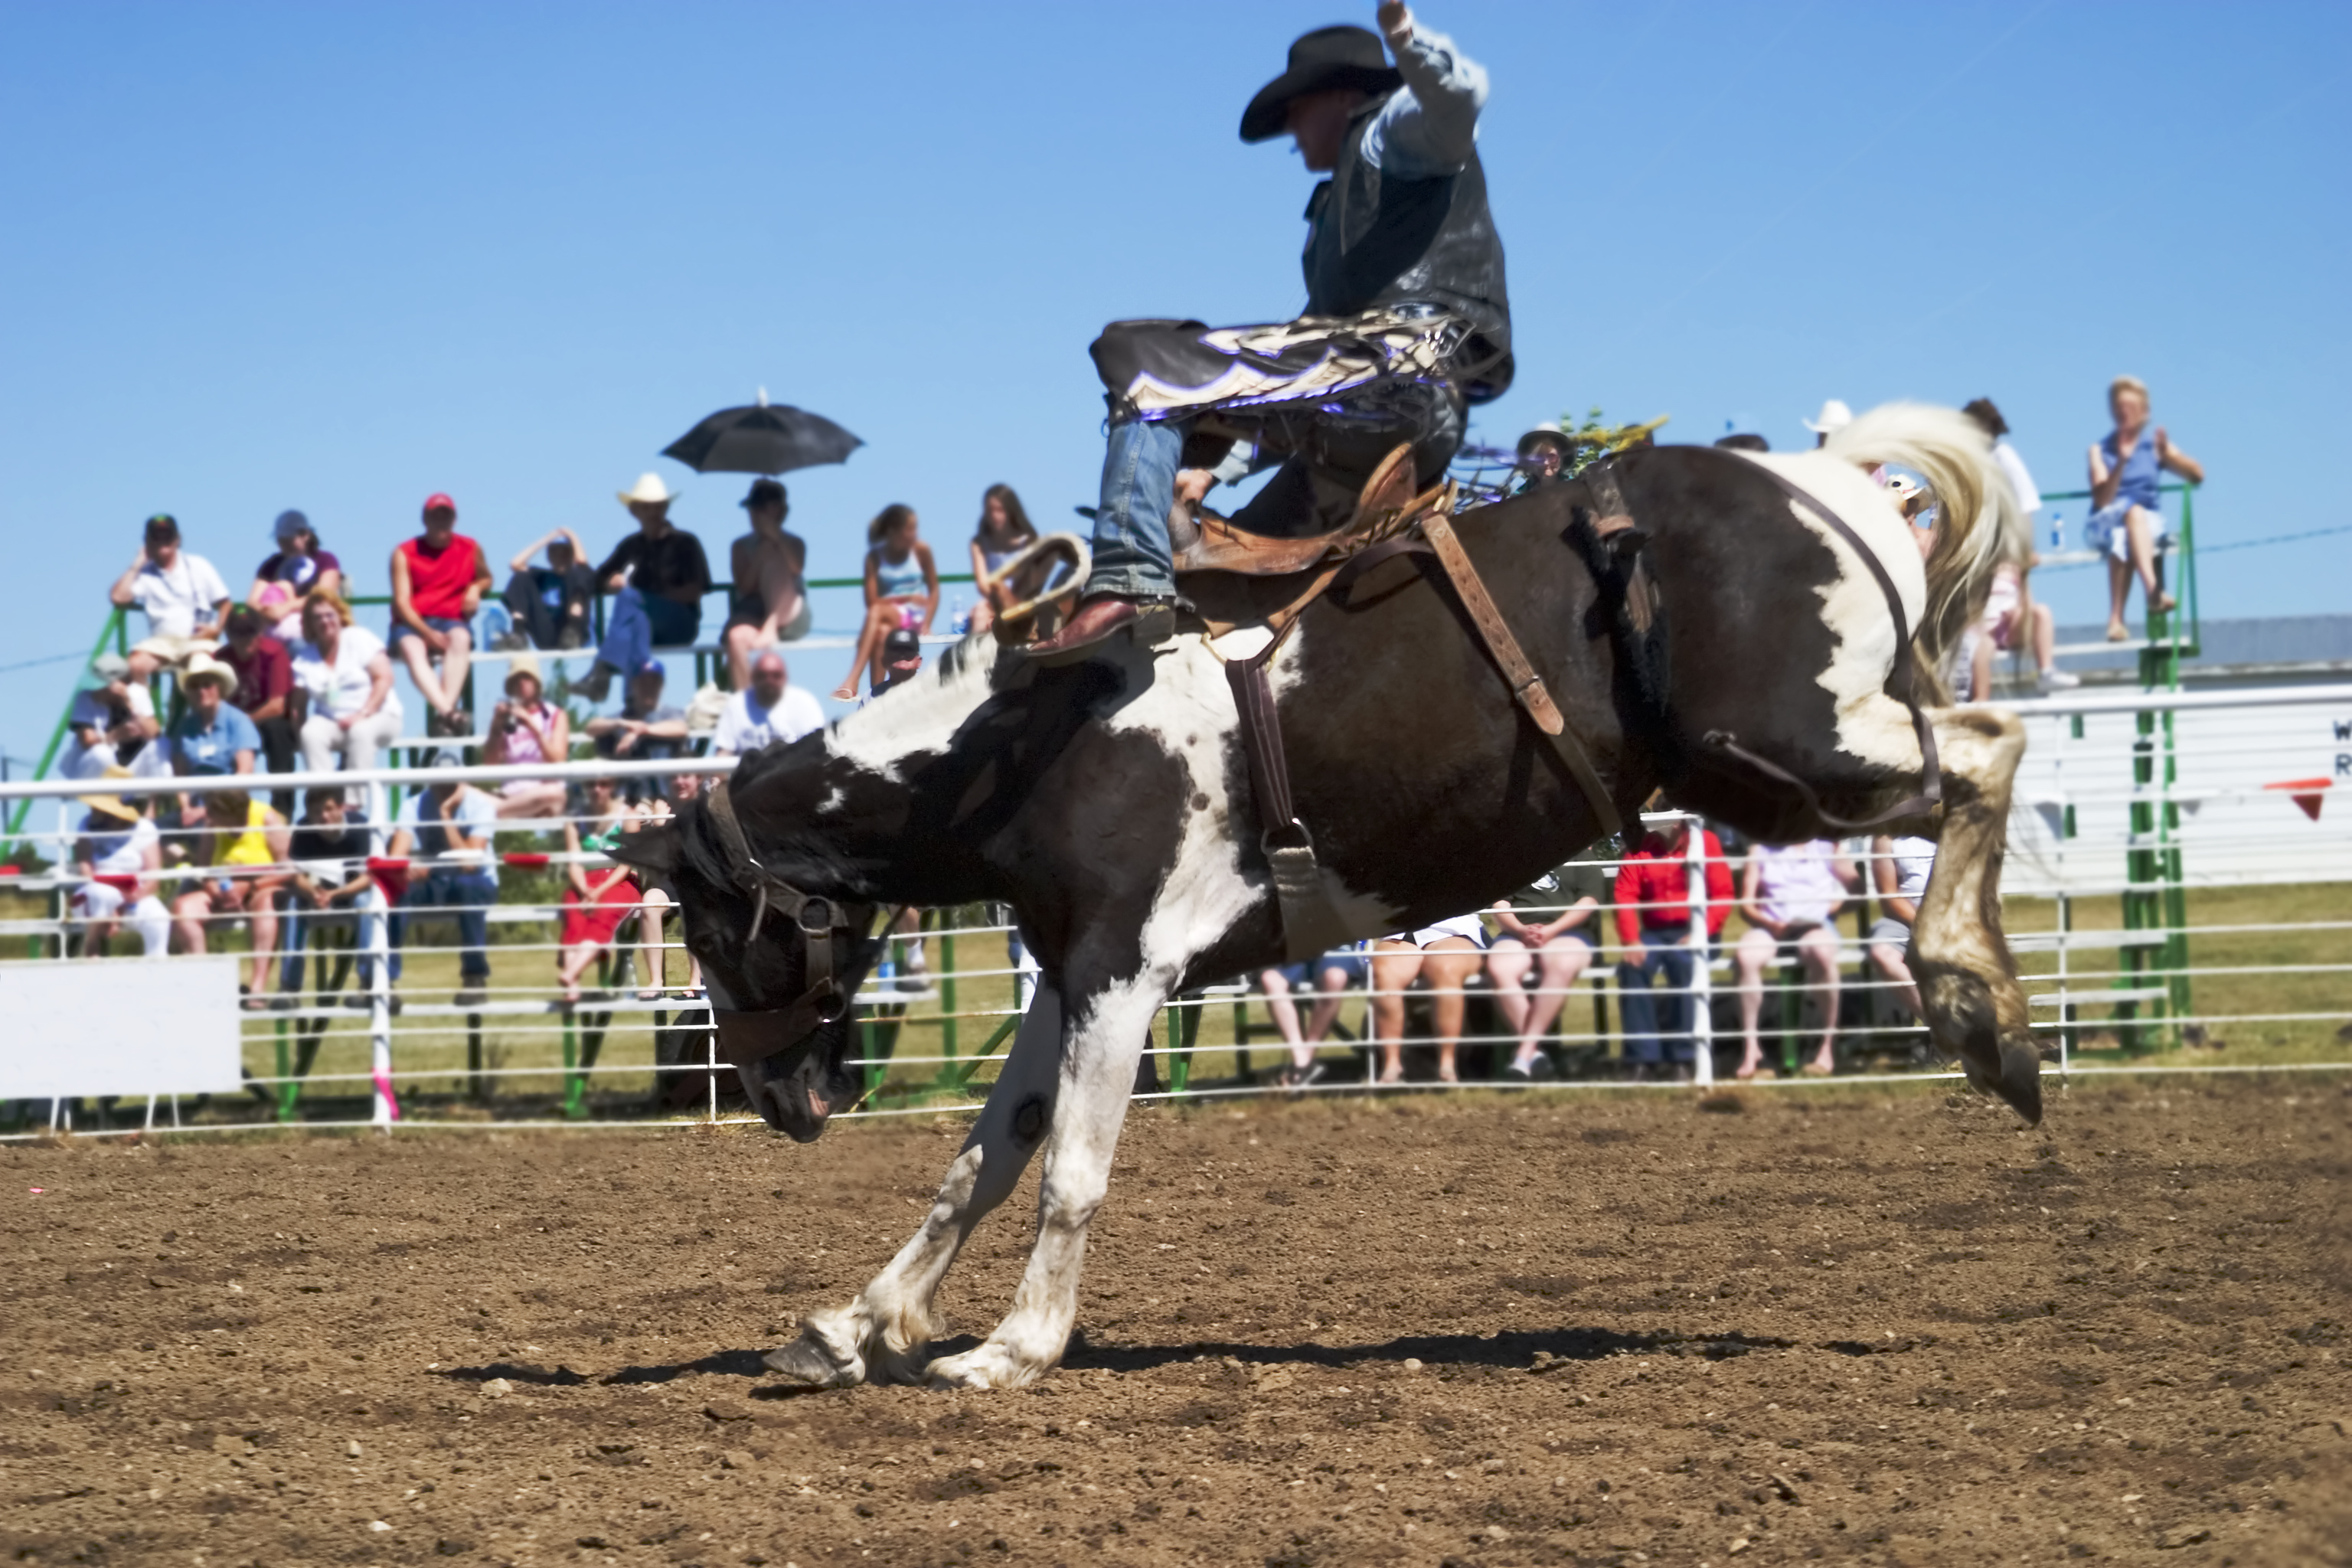 Rodeo in Saskatchewan